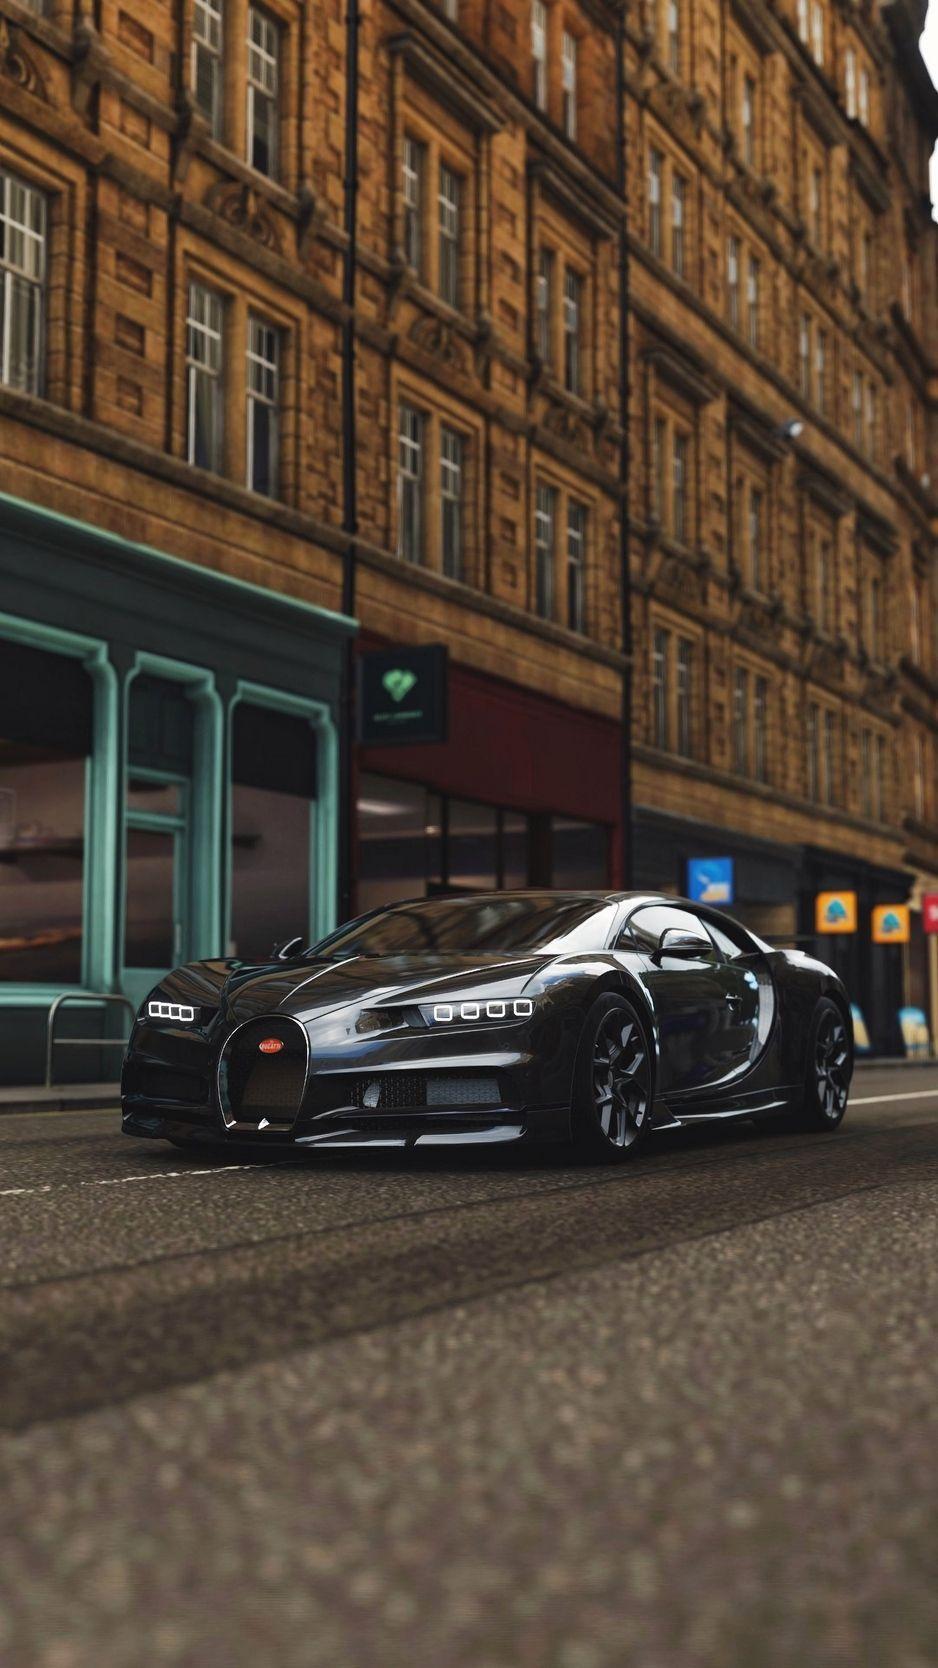 Bugatti Iphone Wallpapers Top Free Bugatti Iphone Backgrounds Wallpaperaccess